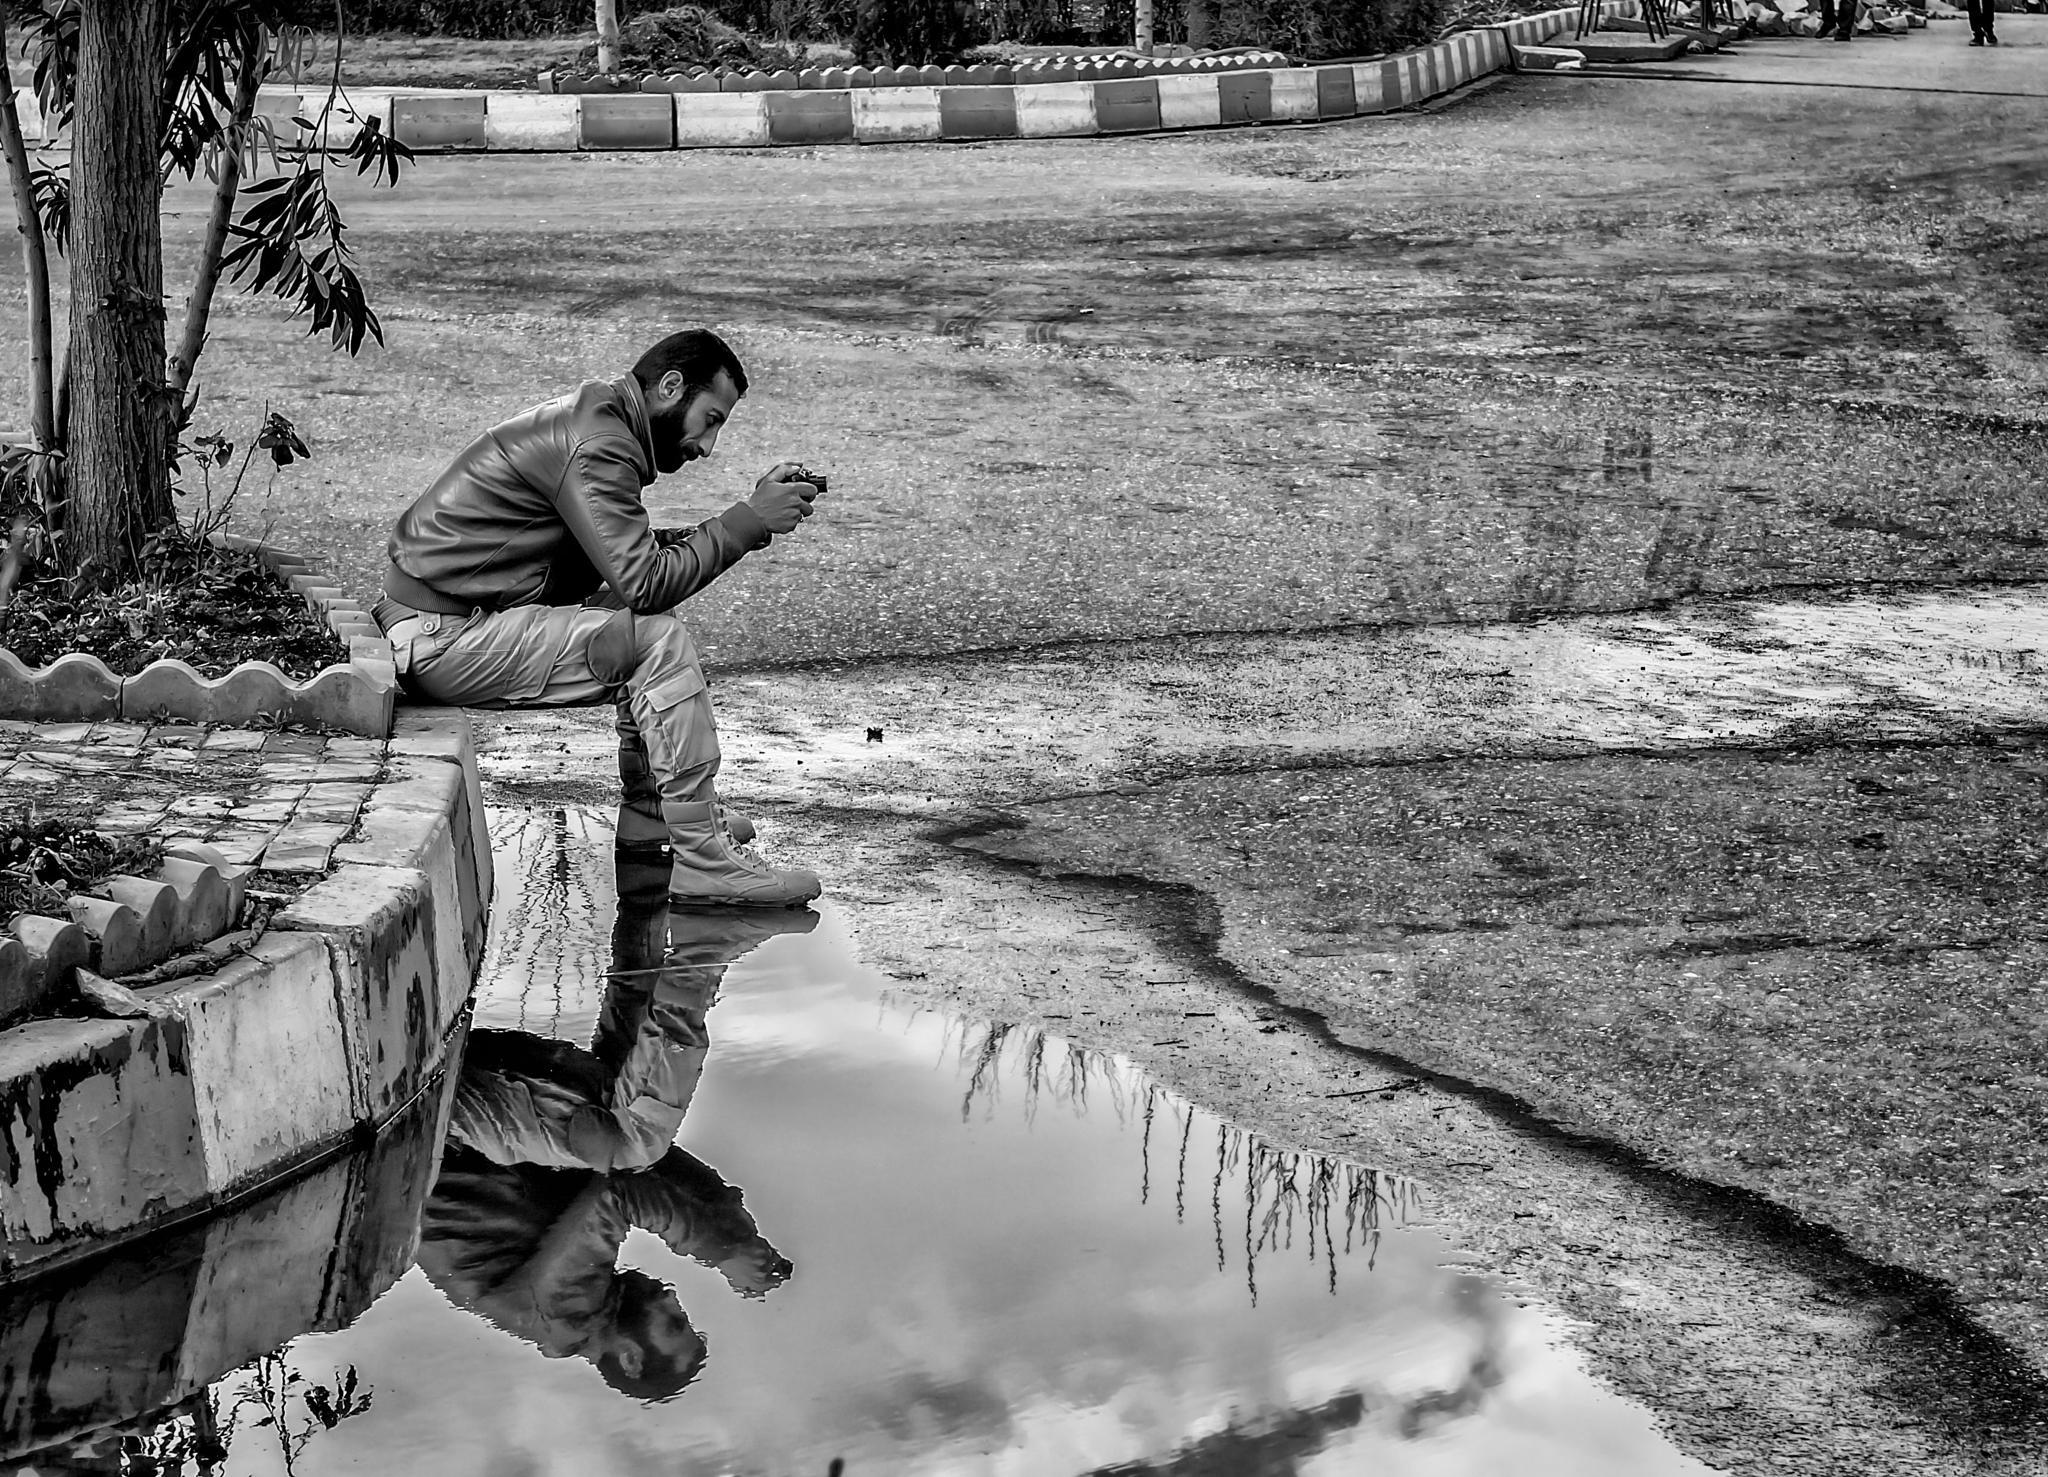 Reflection by Saman A. Ali